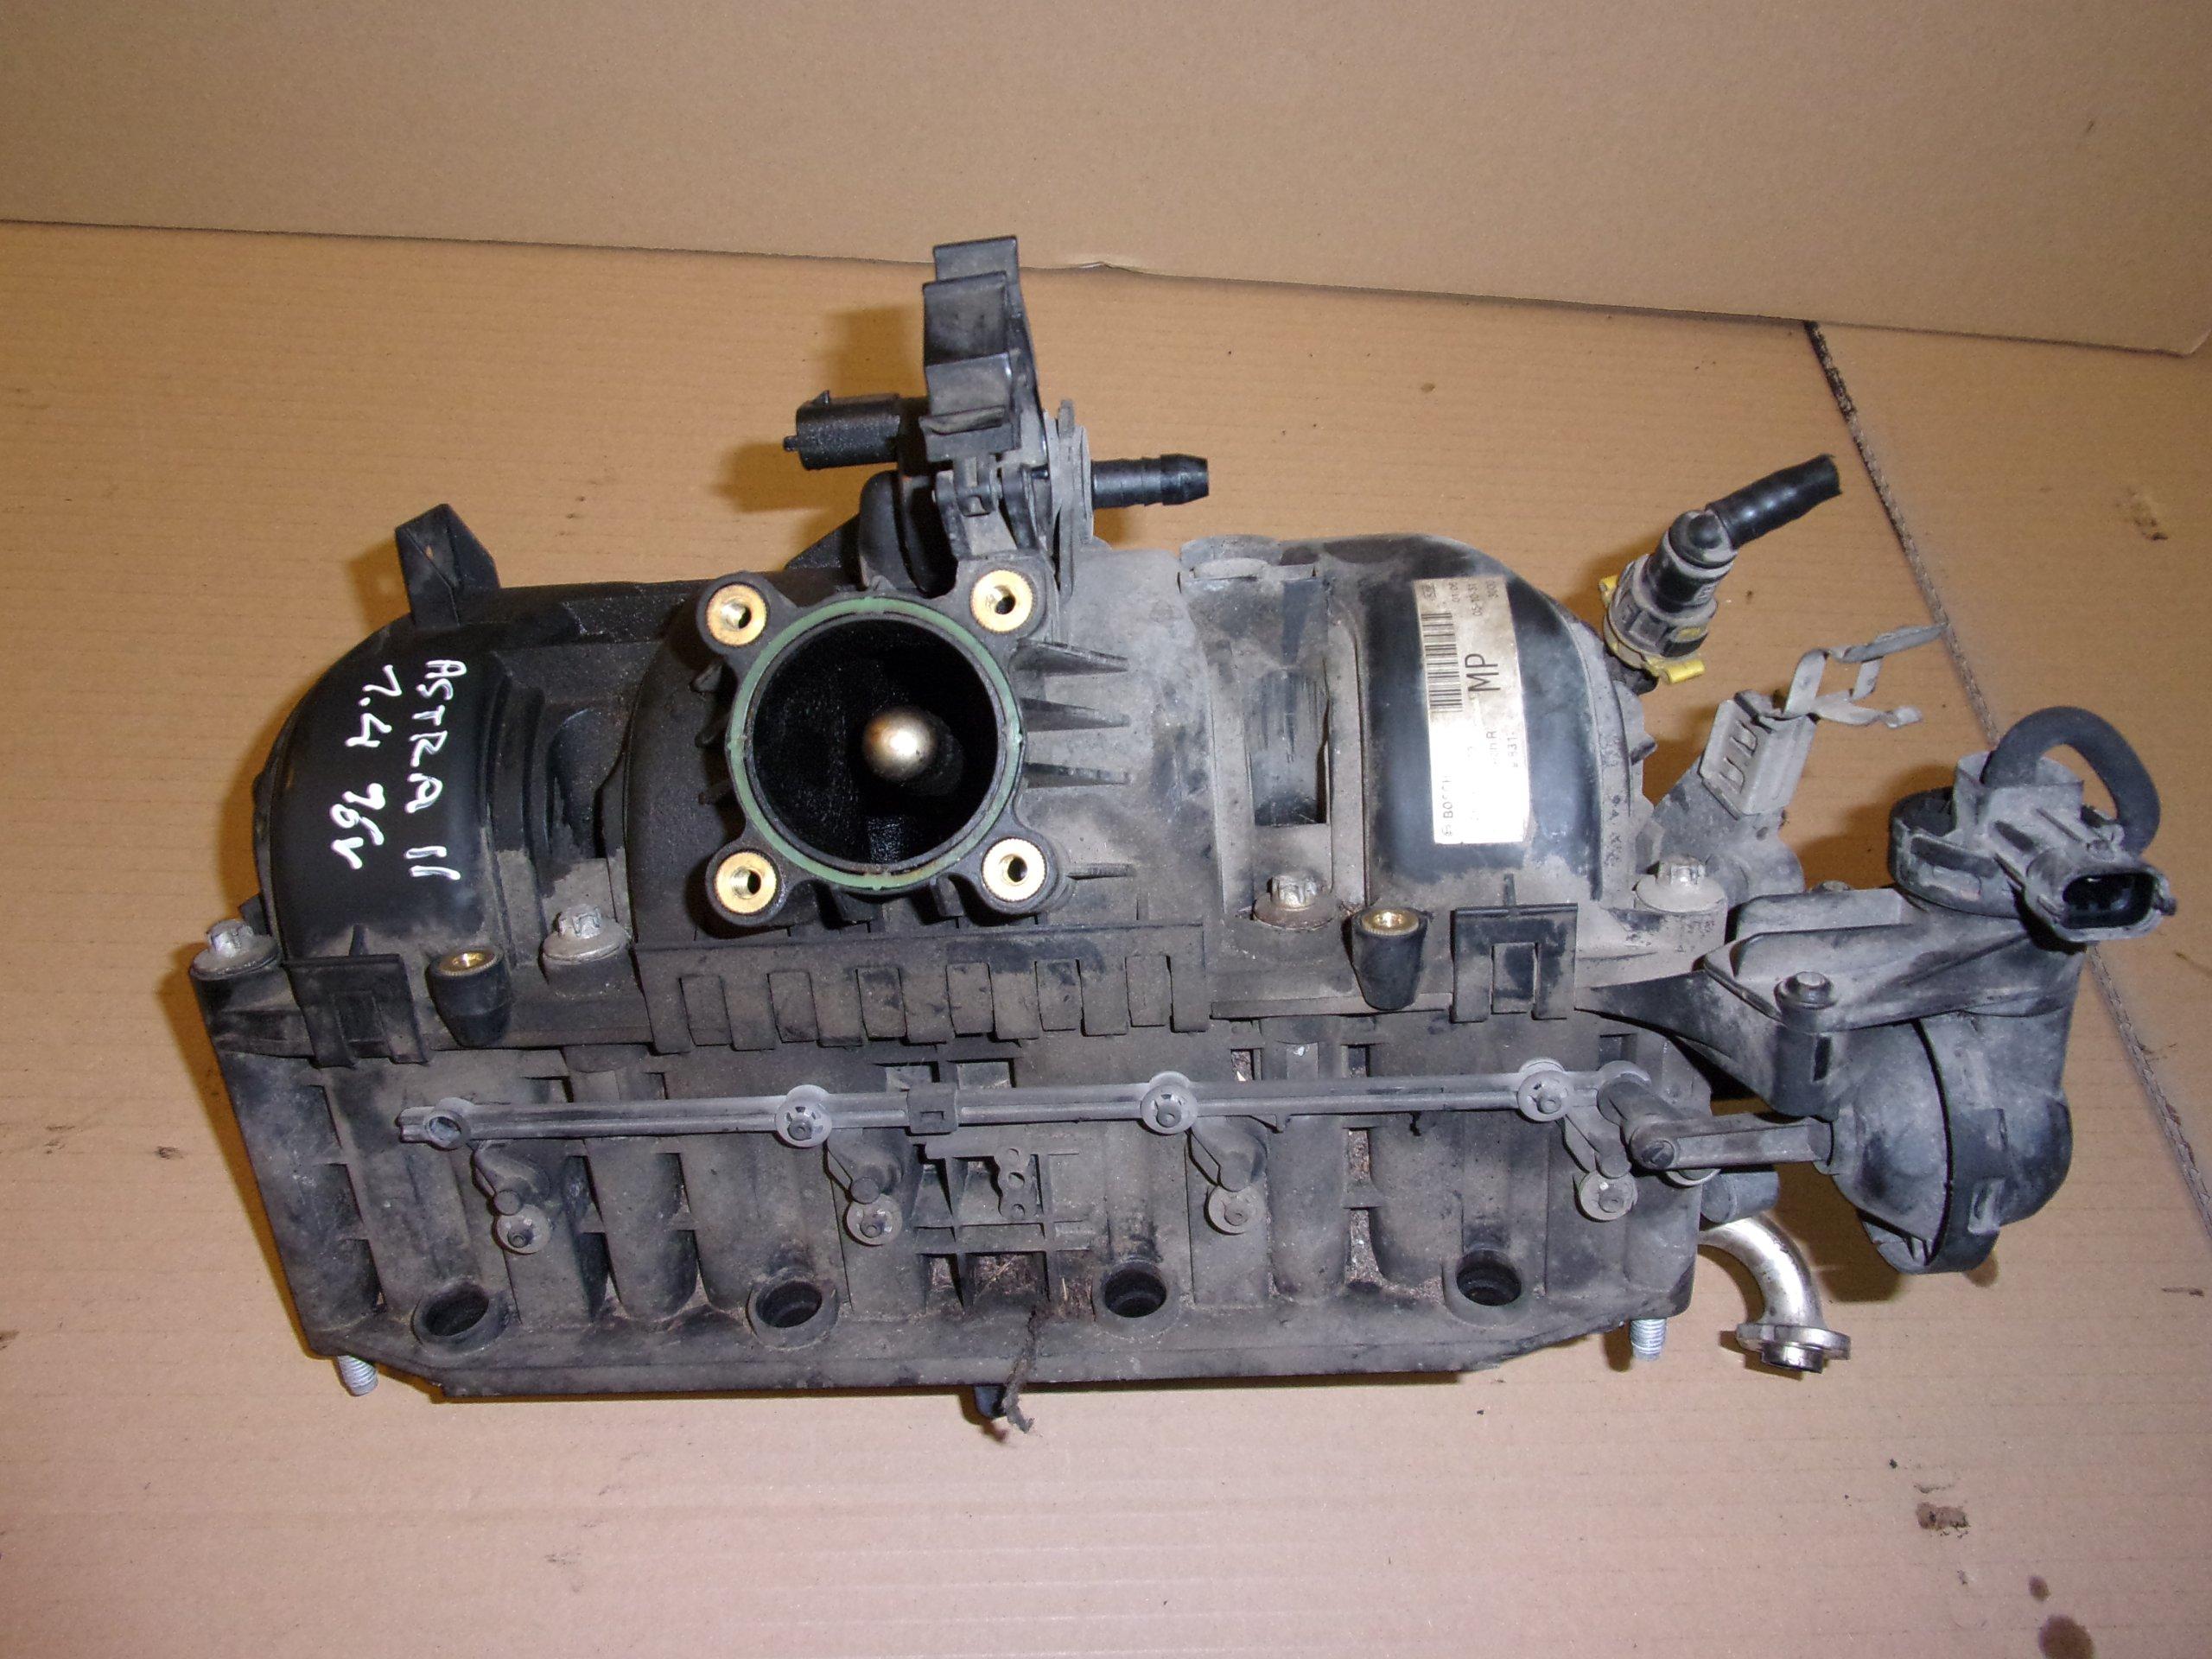 Opel Astra 1 6 Twinport Opel Astra 1 6 Twinport Technical